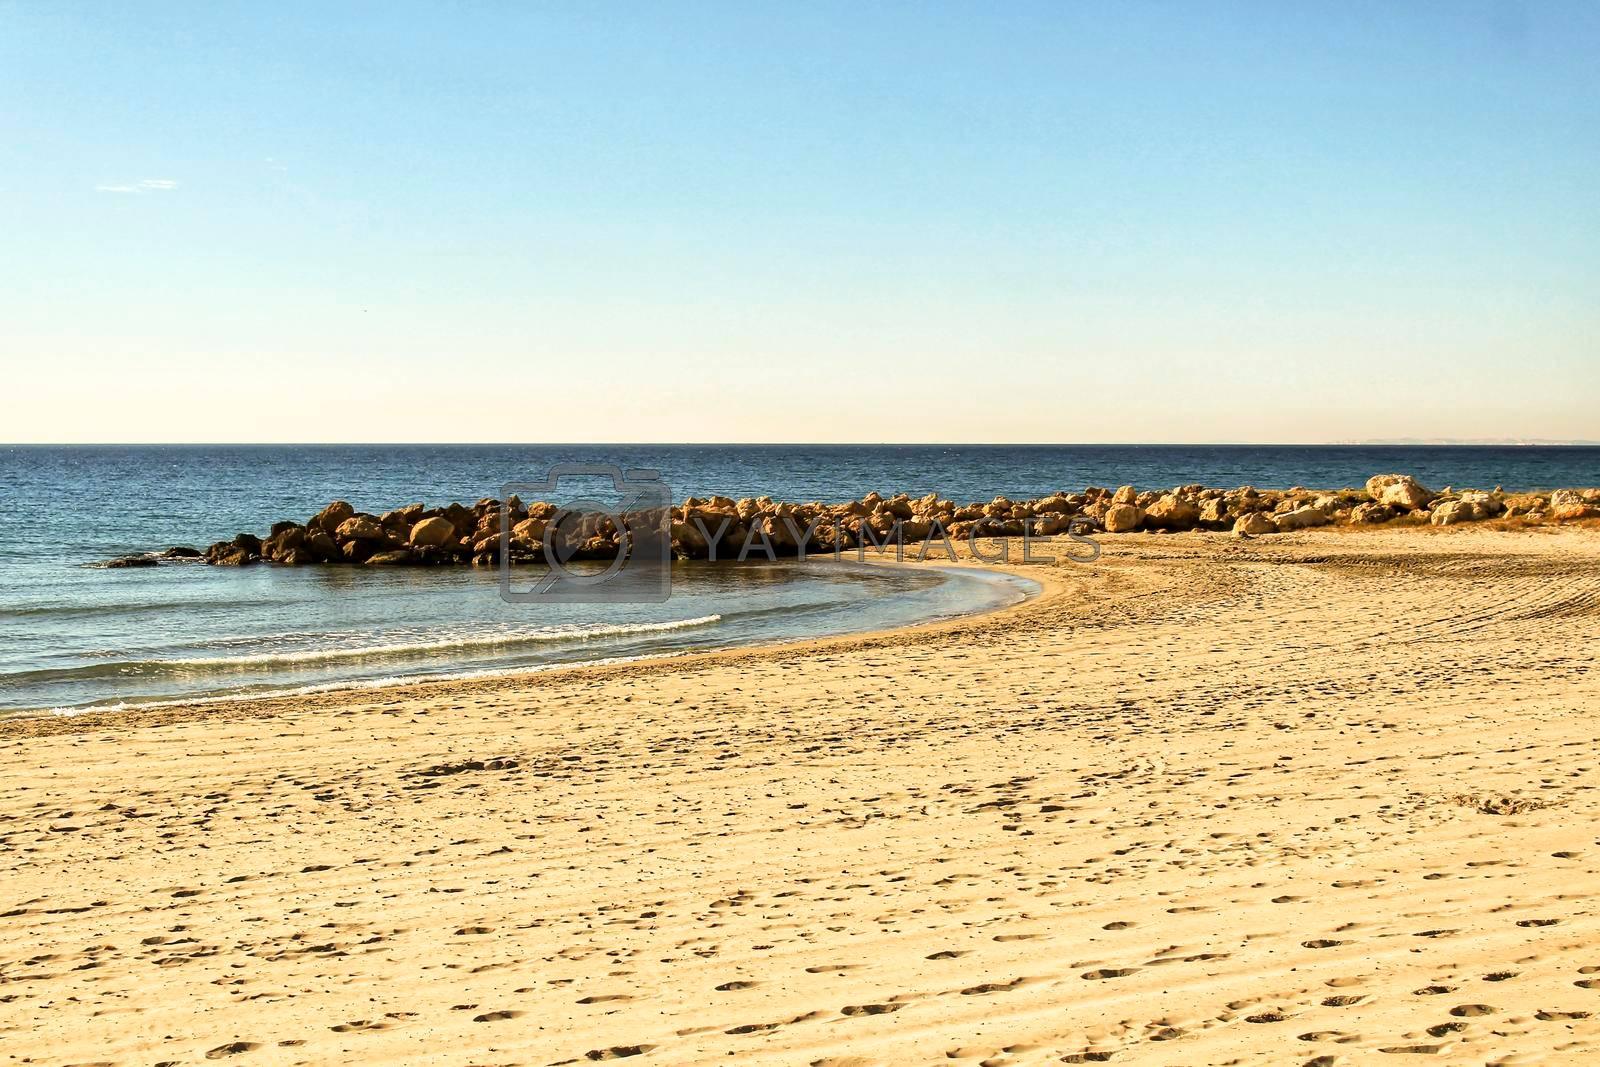 Beach in the morning in Southern Spain, Santa Pola, Alicante